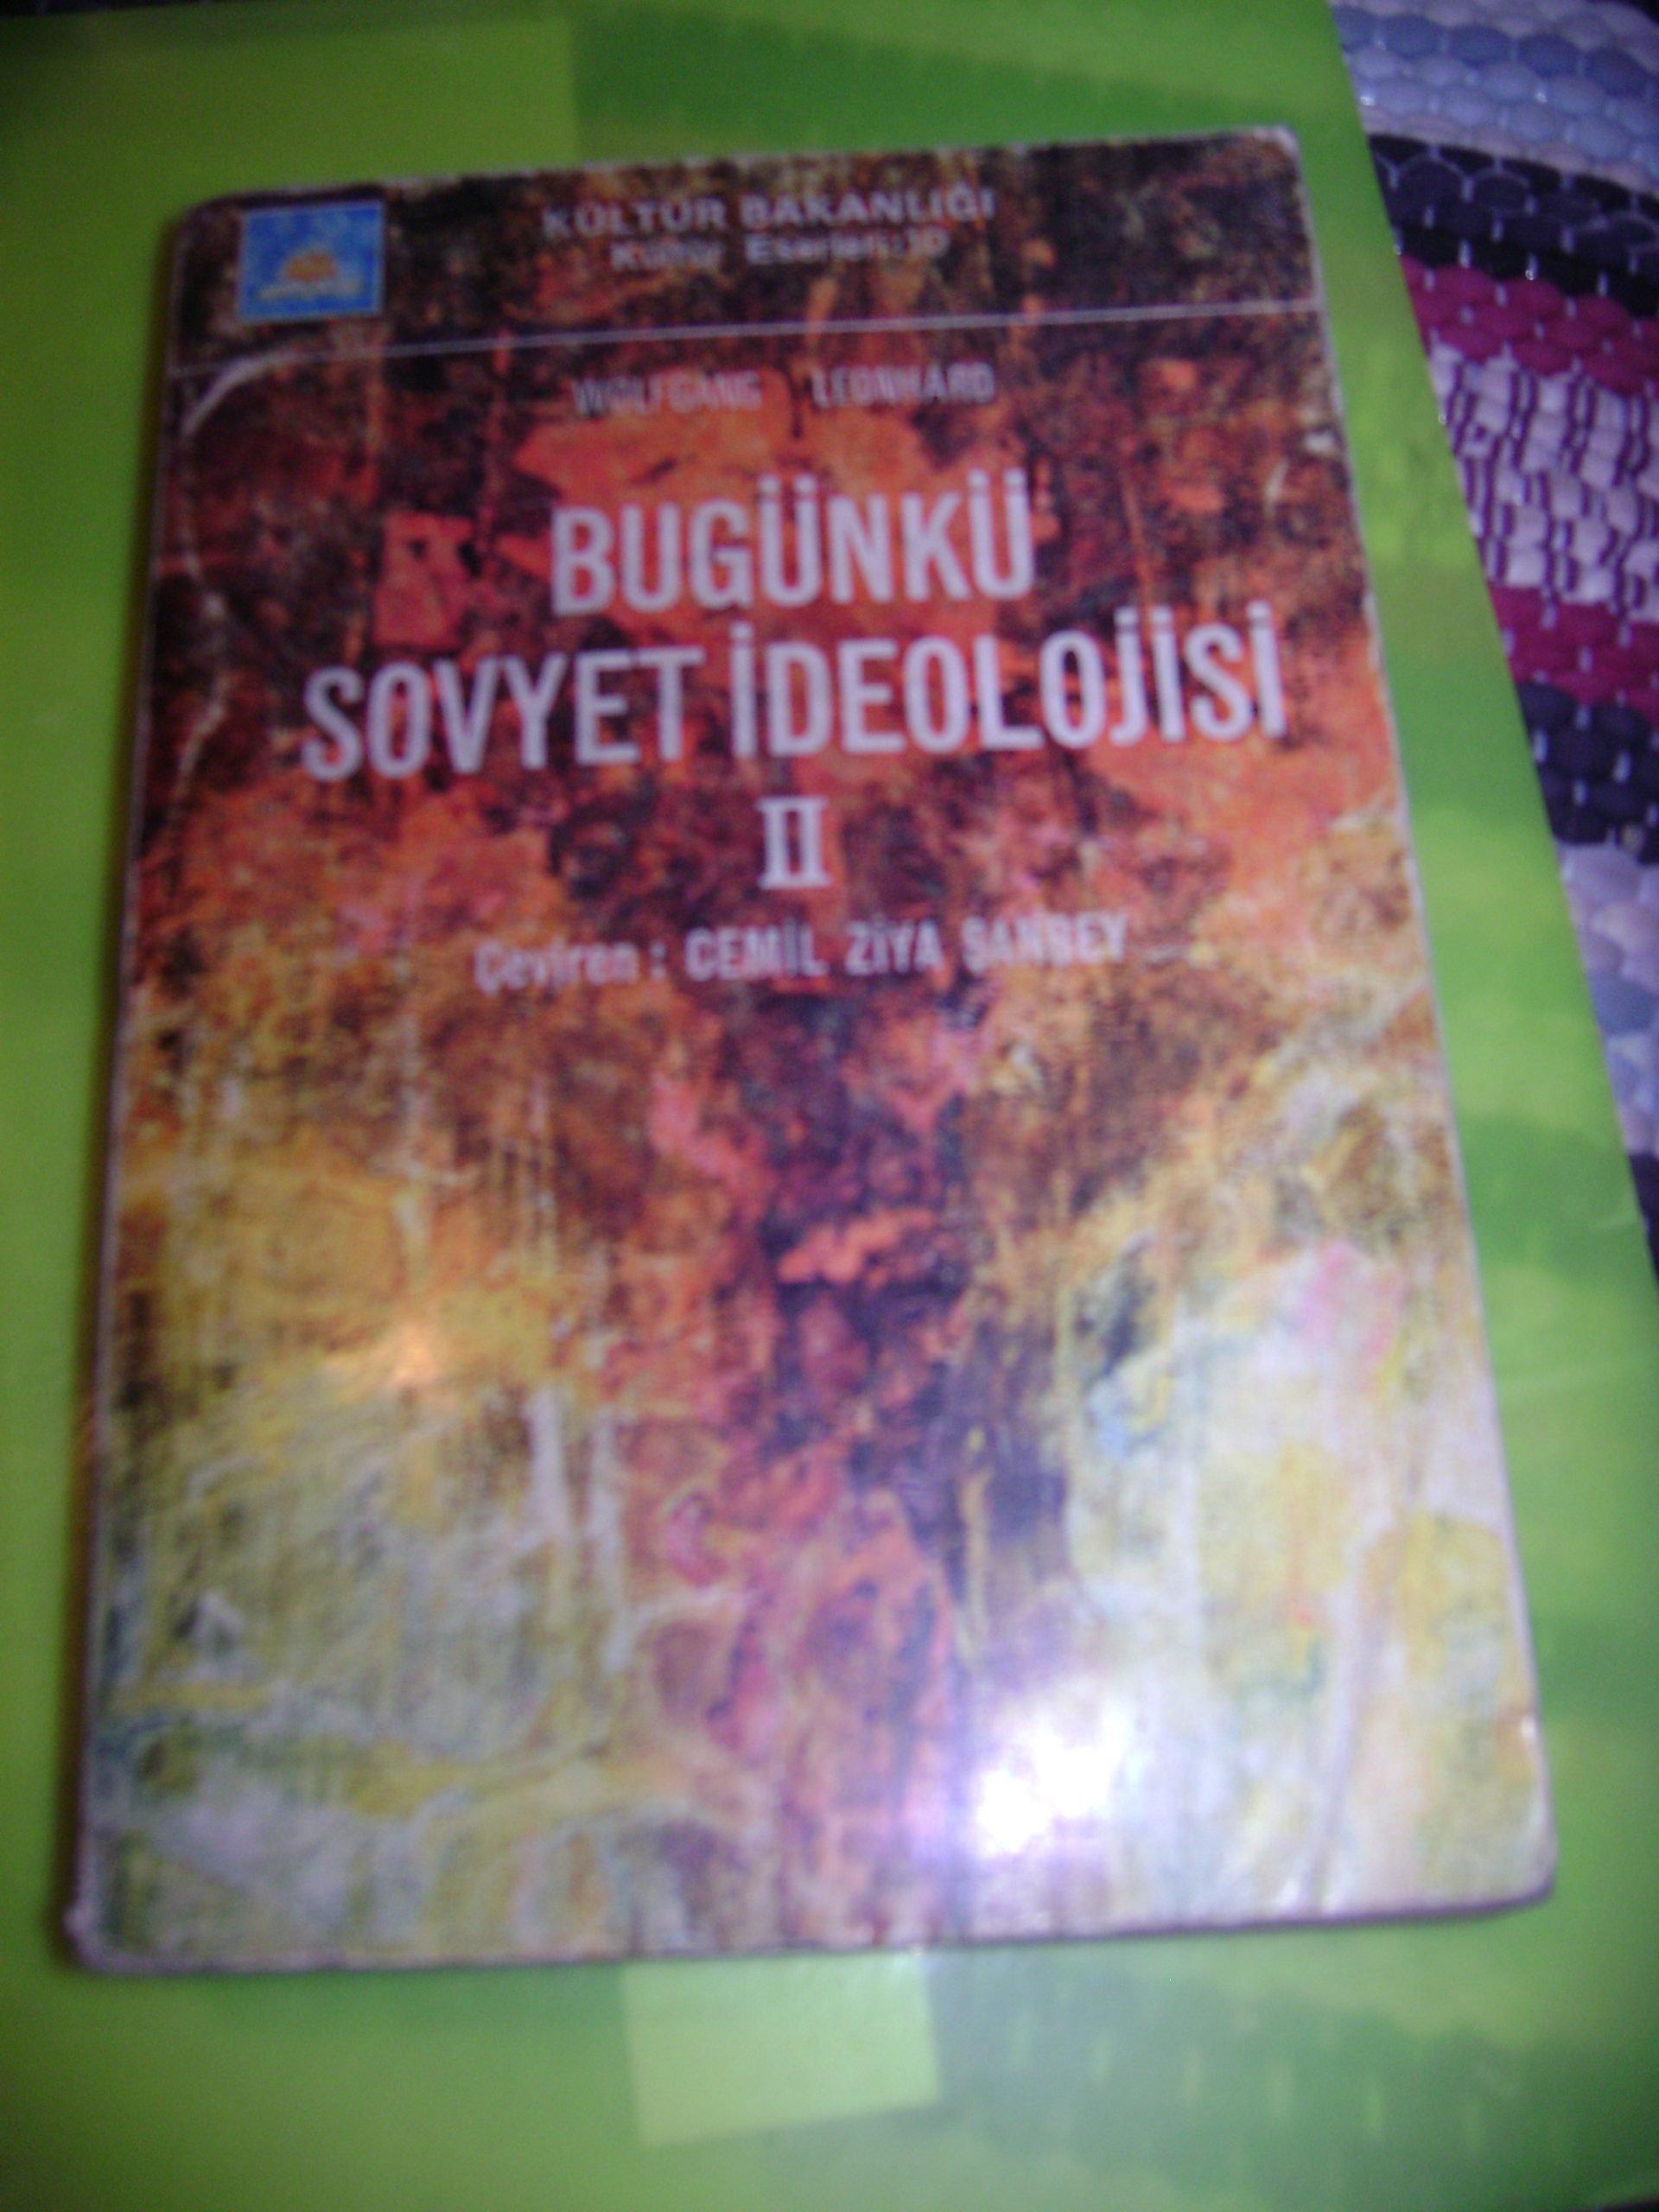 BUGÜNKÜ SOVYET İDEOLOJİSİ II /Wolfgang Leonhard/ 15 tl